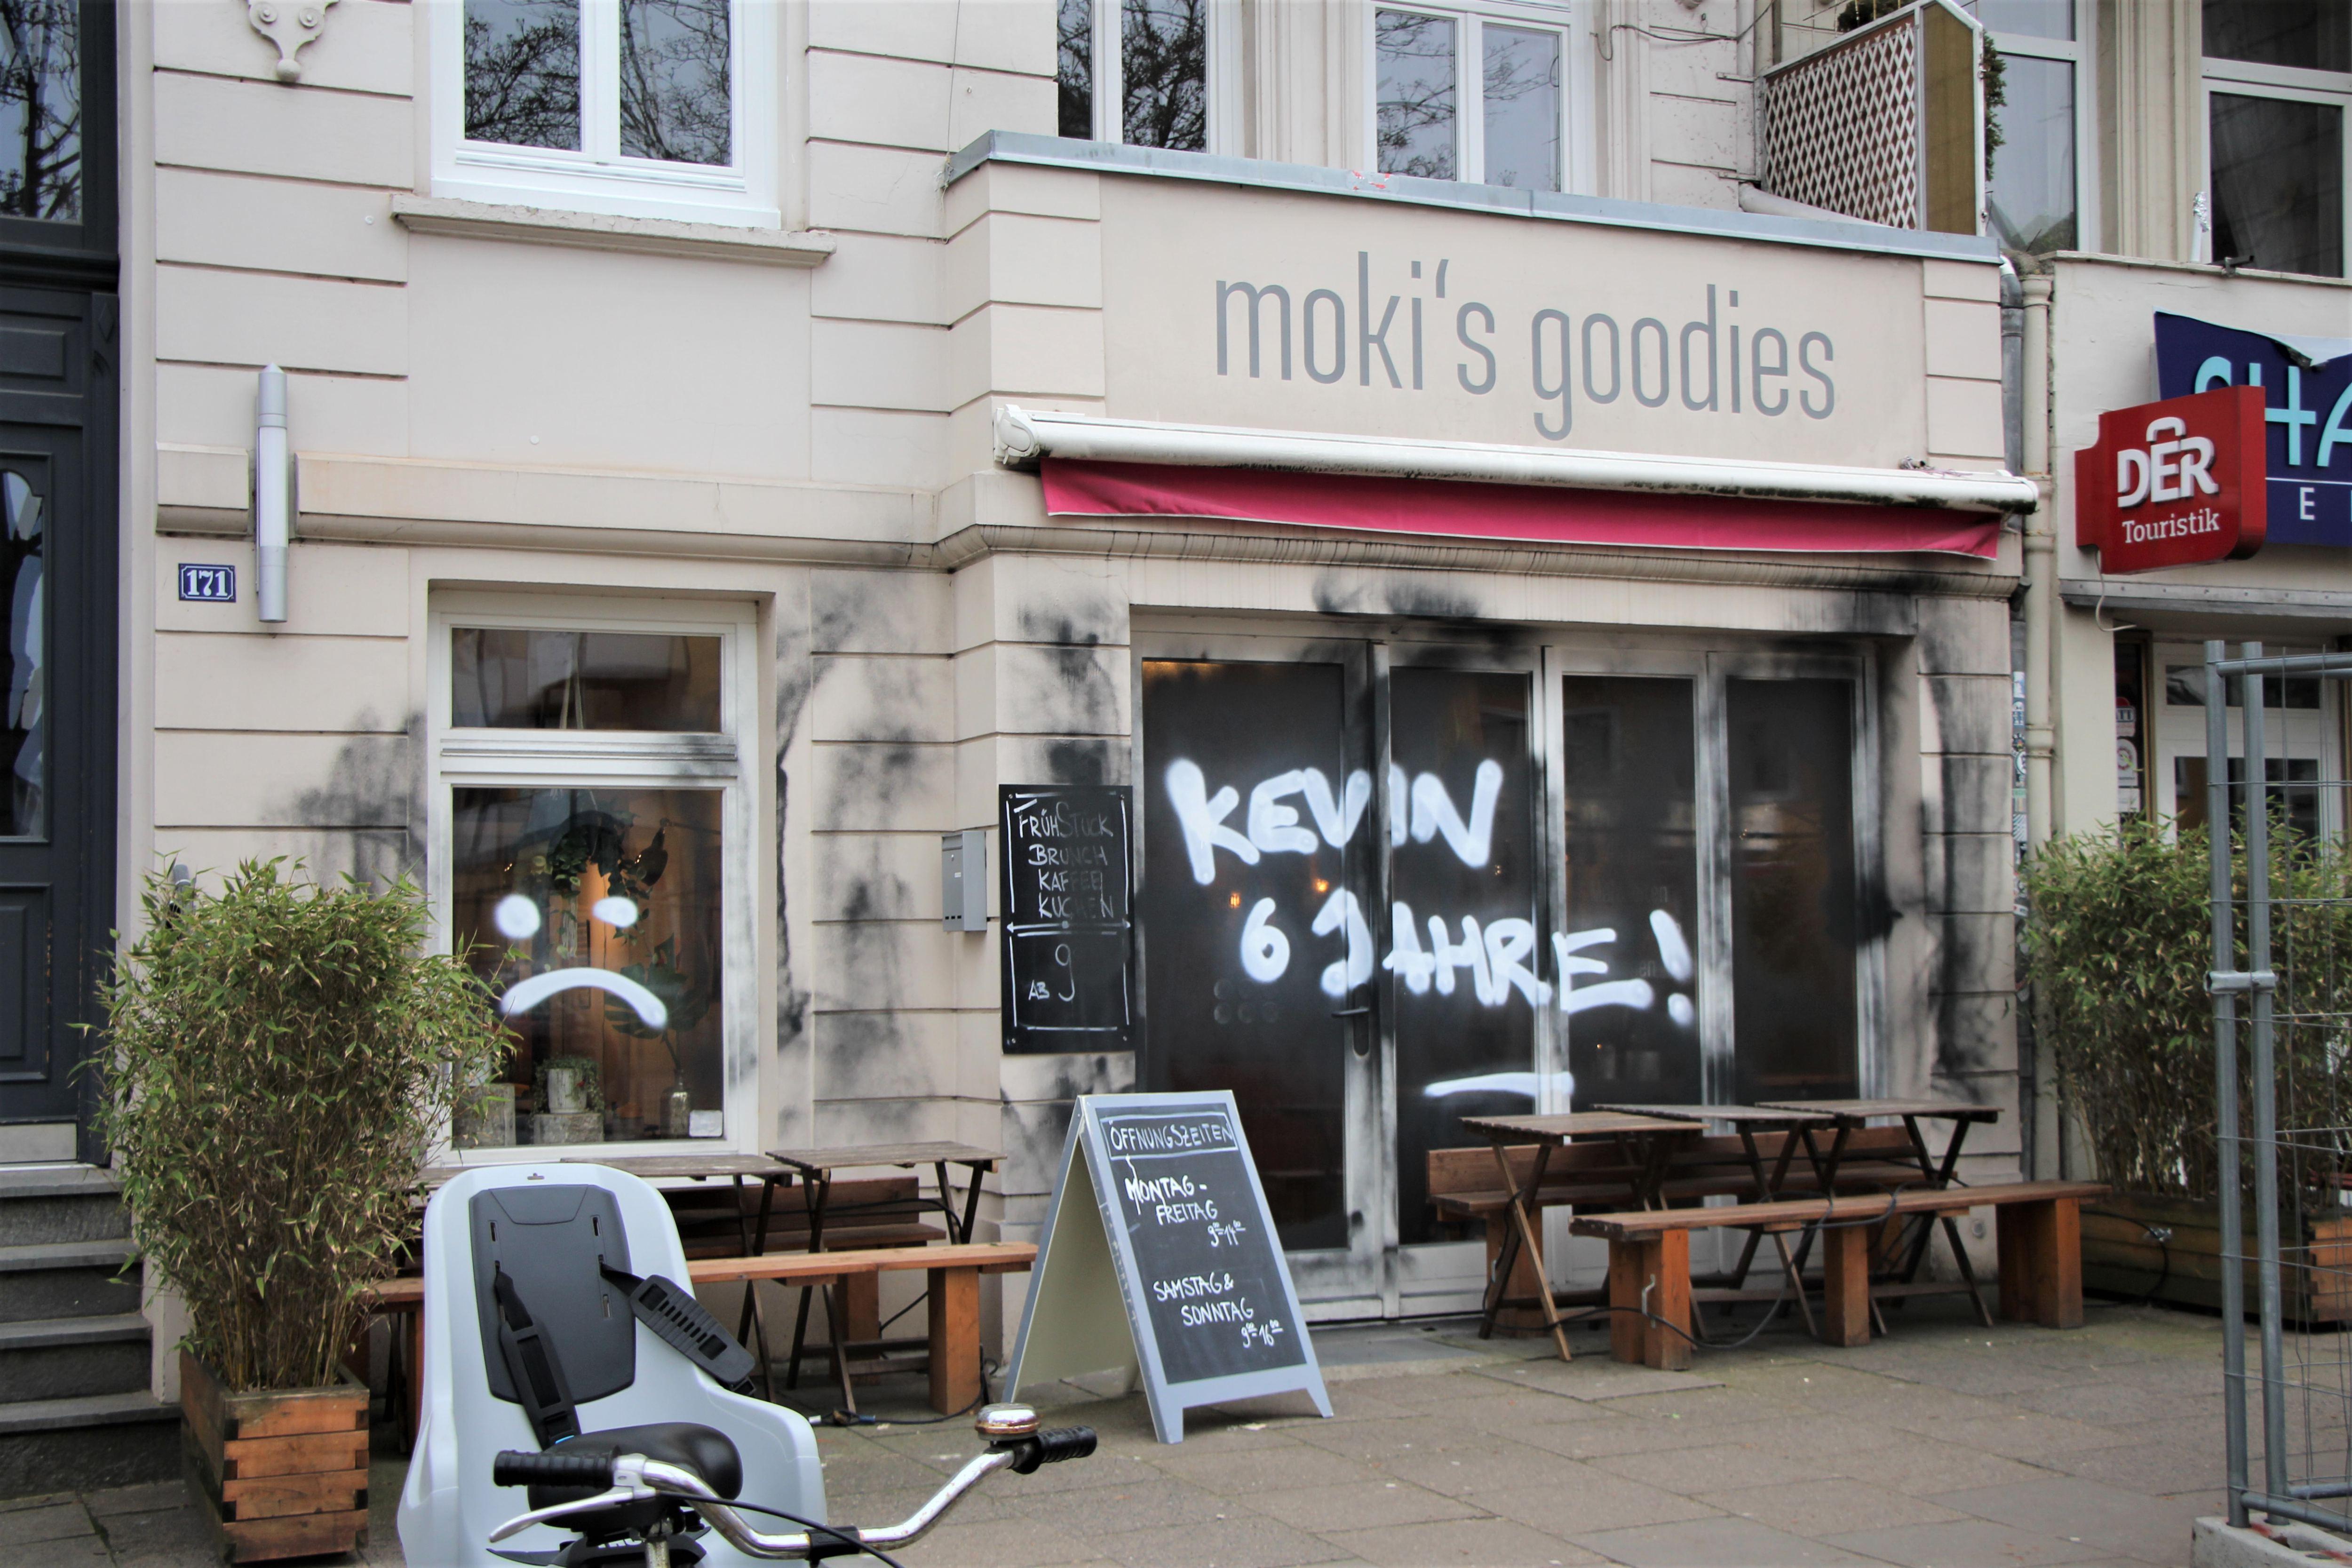 Moki's Goodies: Vandalismus nach Kinderverbot